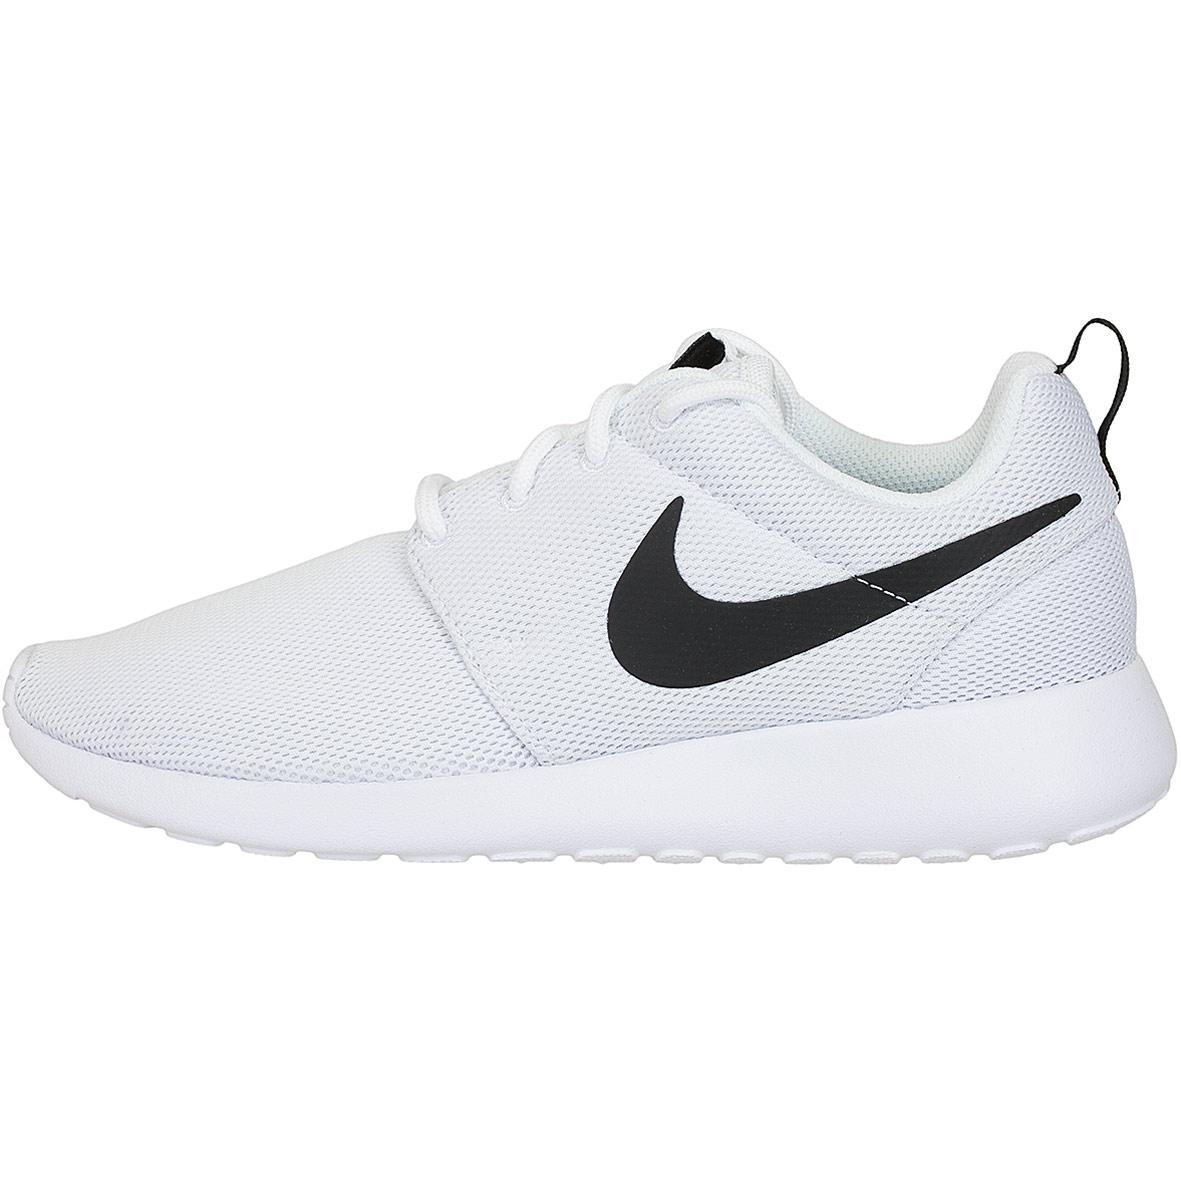 buy popular 0a008 ad5d9 ... inexpensive nike damen sneaker roshe one weiß schwarz ab402 972ff